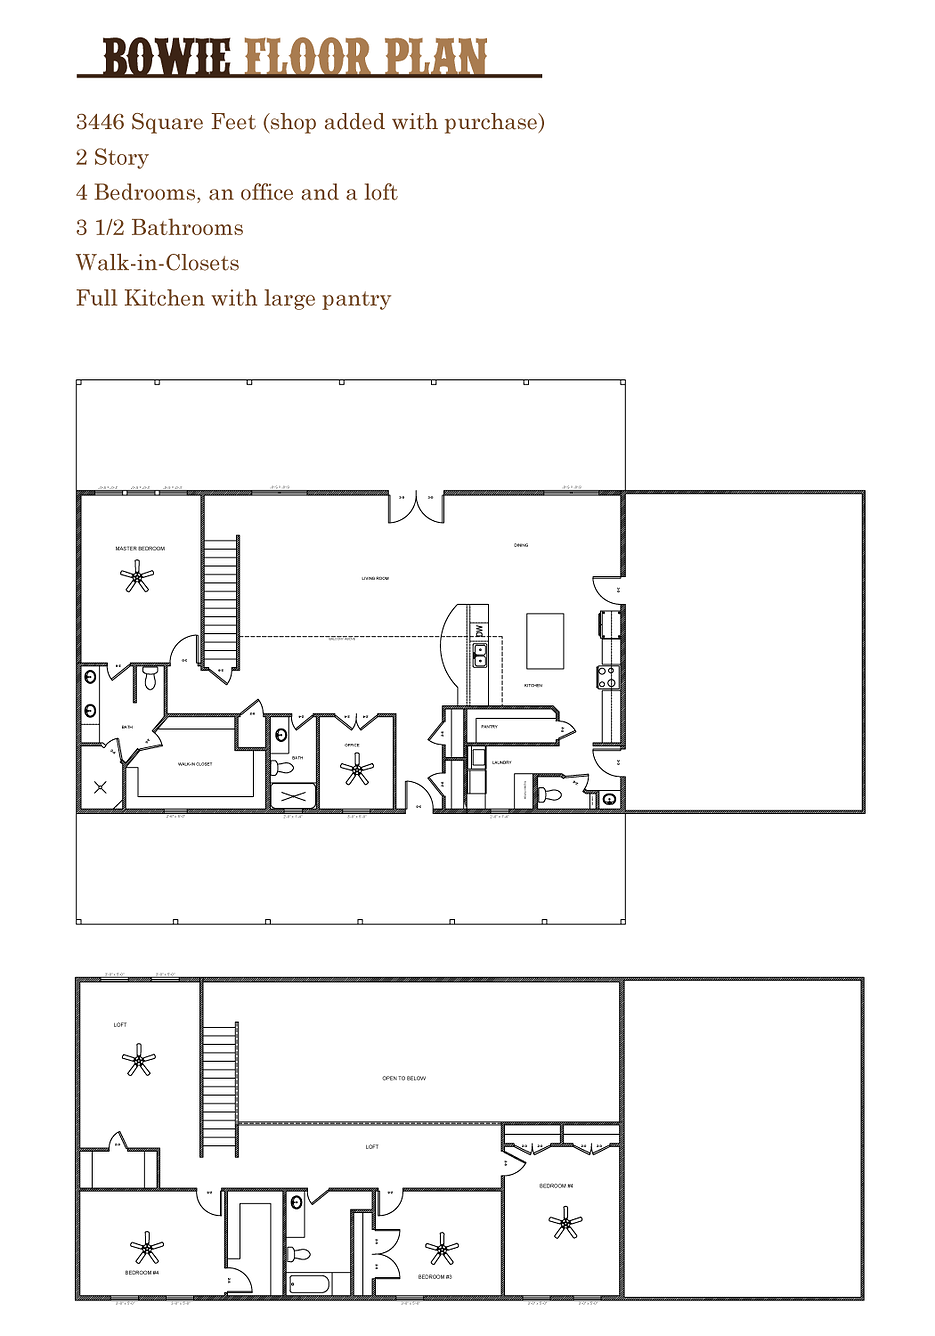 Tons Of Storage Barndominium Plans For Sale Bowie Floor